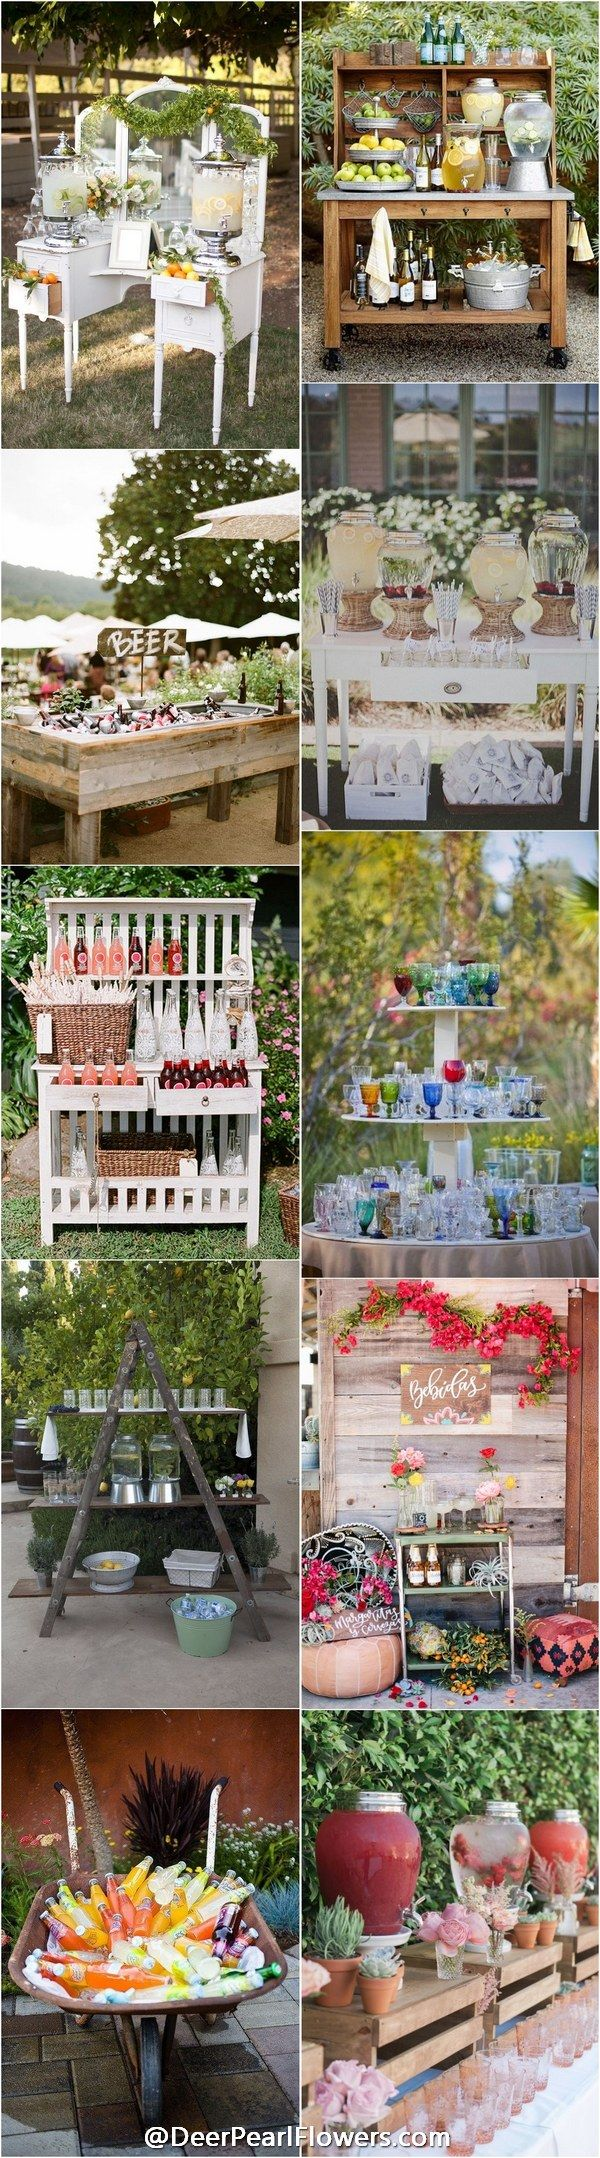 rustic wedding drink station decor ideas / http://www.deerpearlflowers.com/wedding-drink-bar-station-ideas/